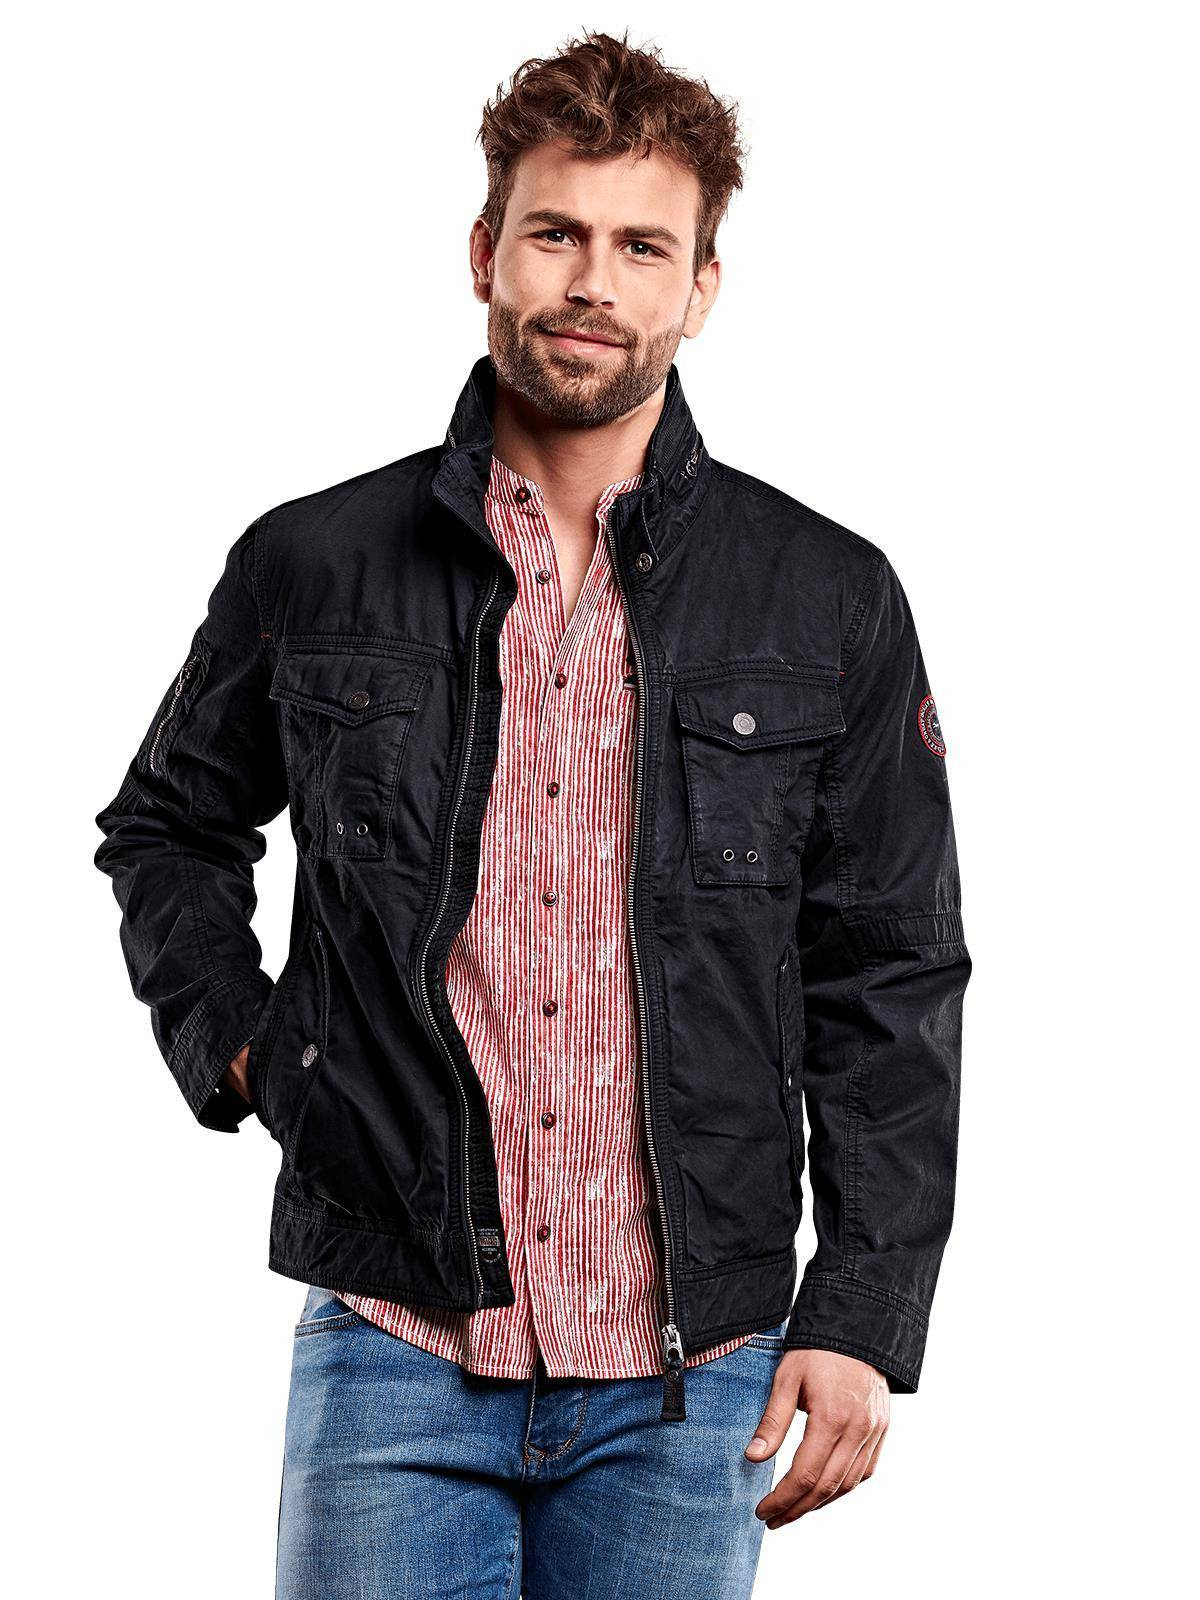 Engbers Stylische feste Baumwolljacke | Bekleidung > Jacken > Fieldjackets | Engbers